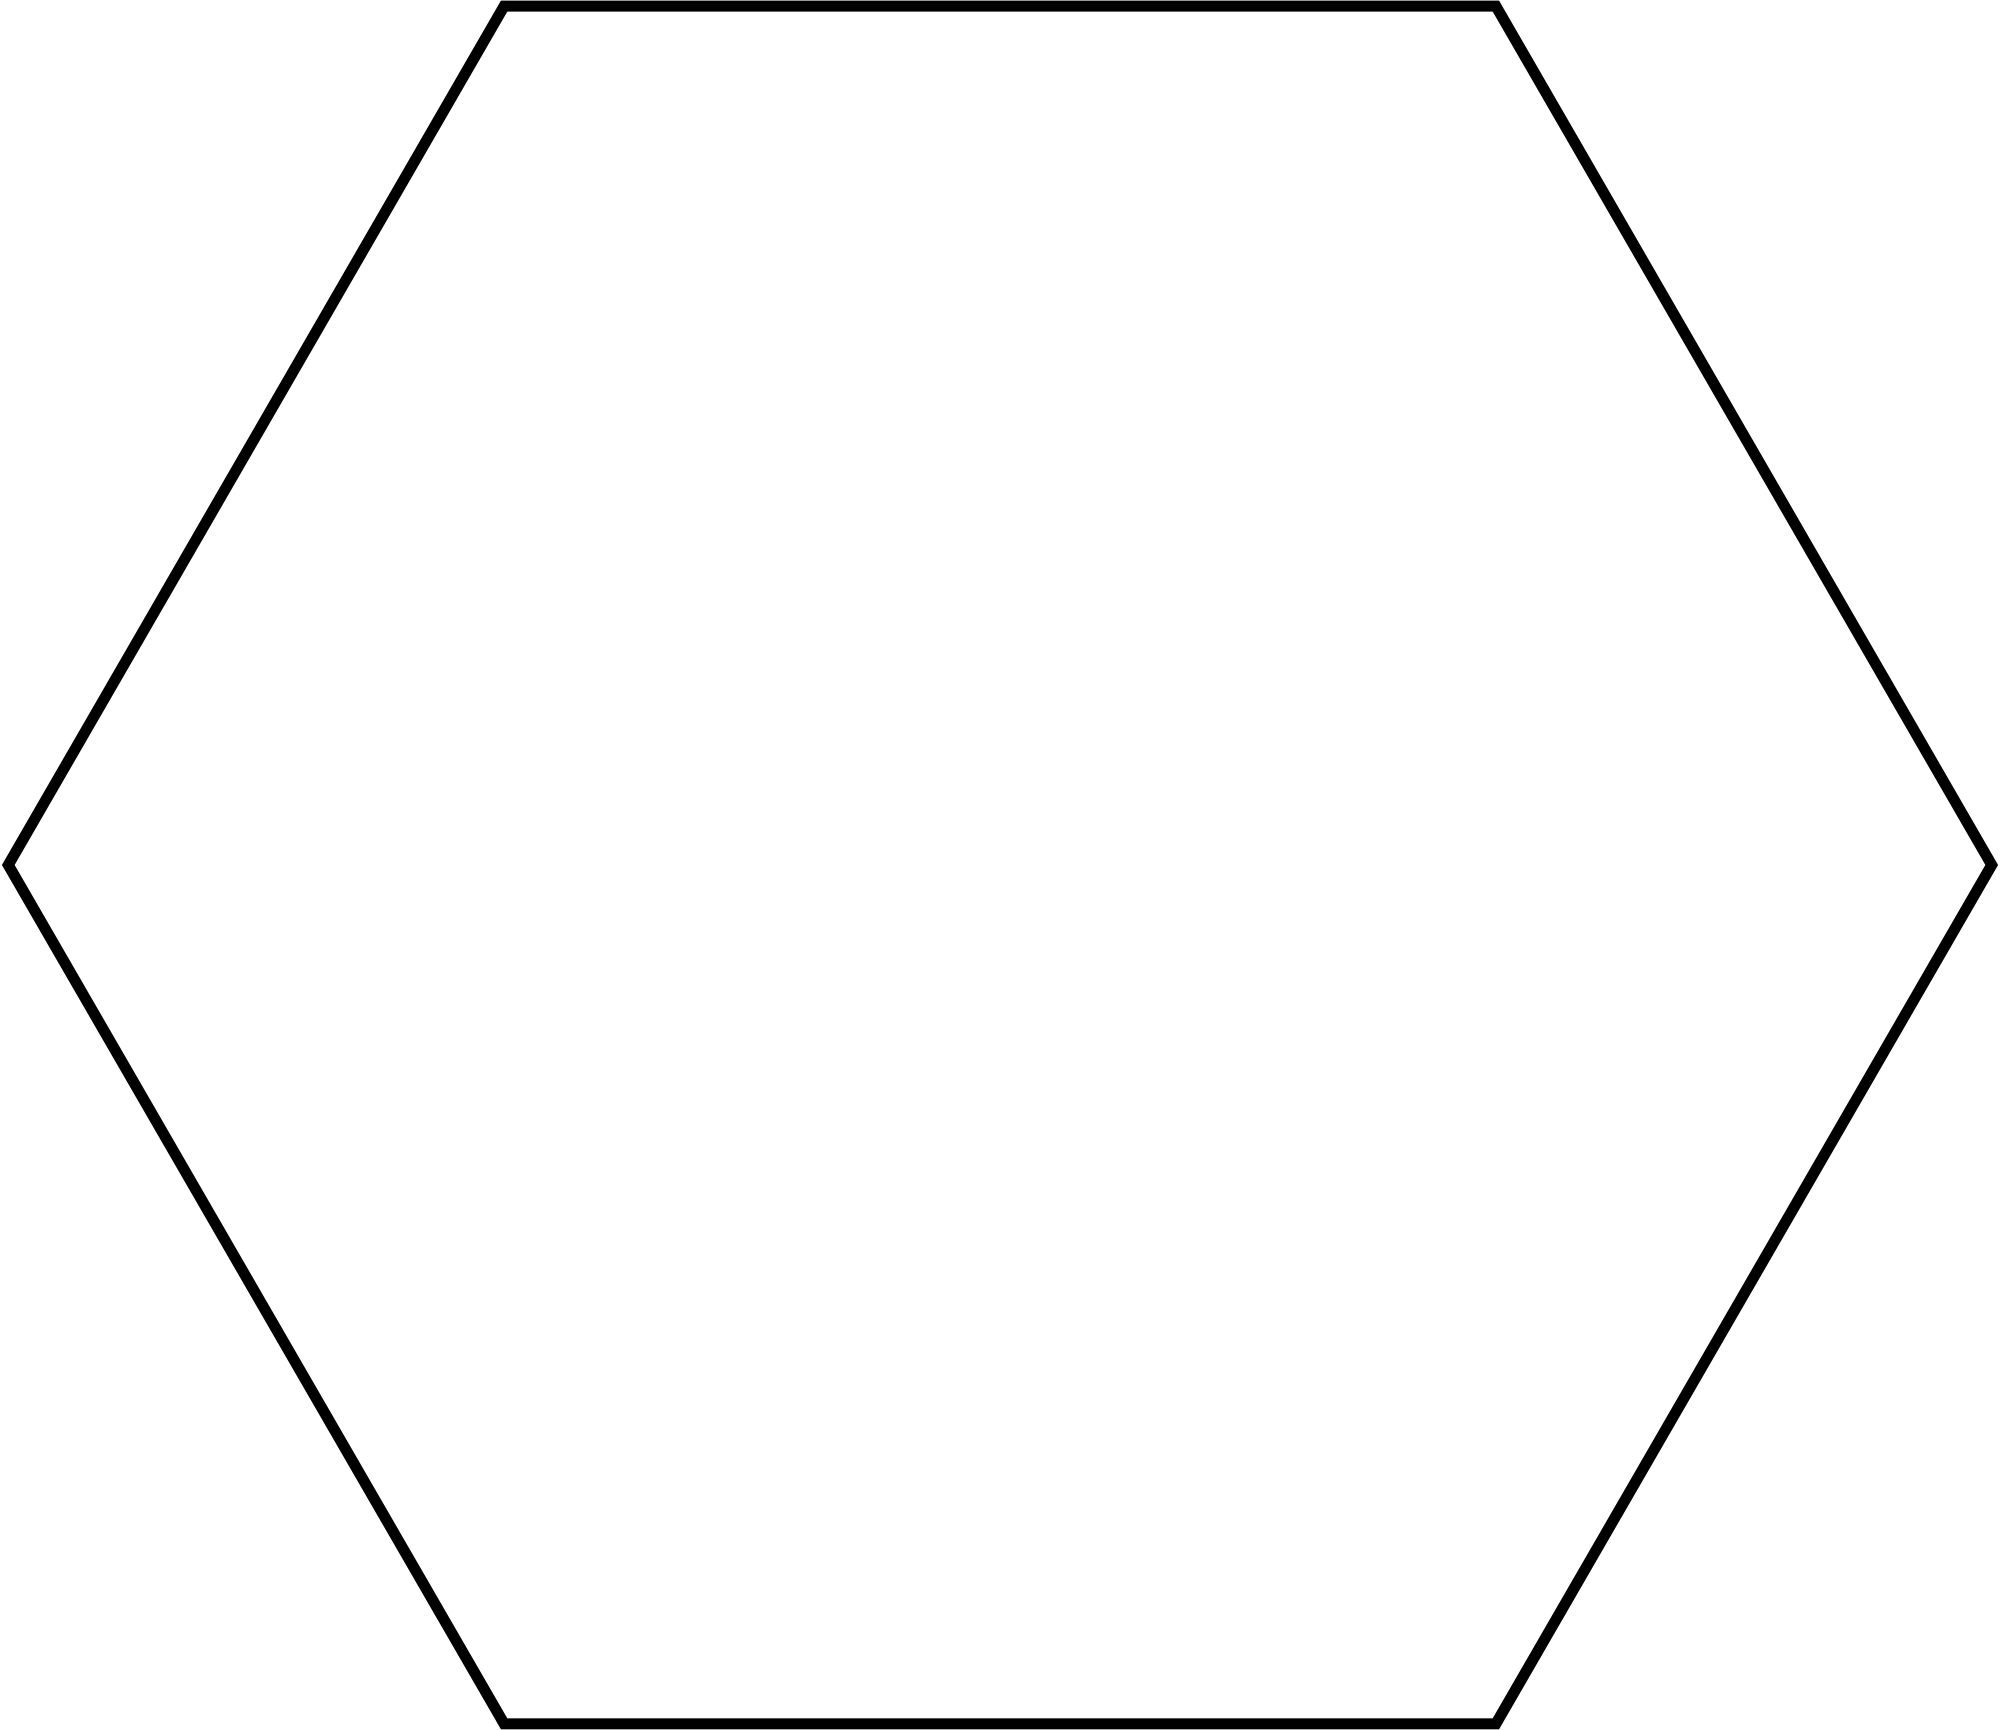 2000x1730 Filehexagon.svg